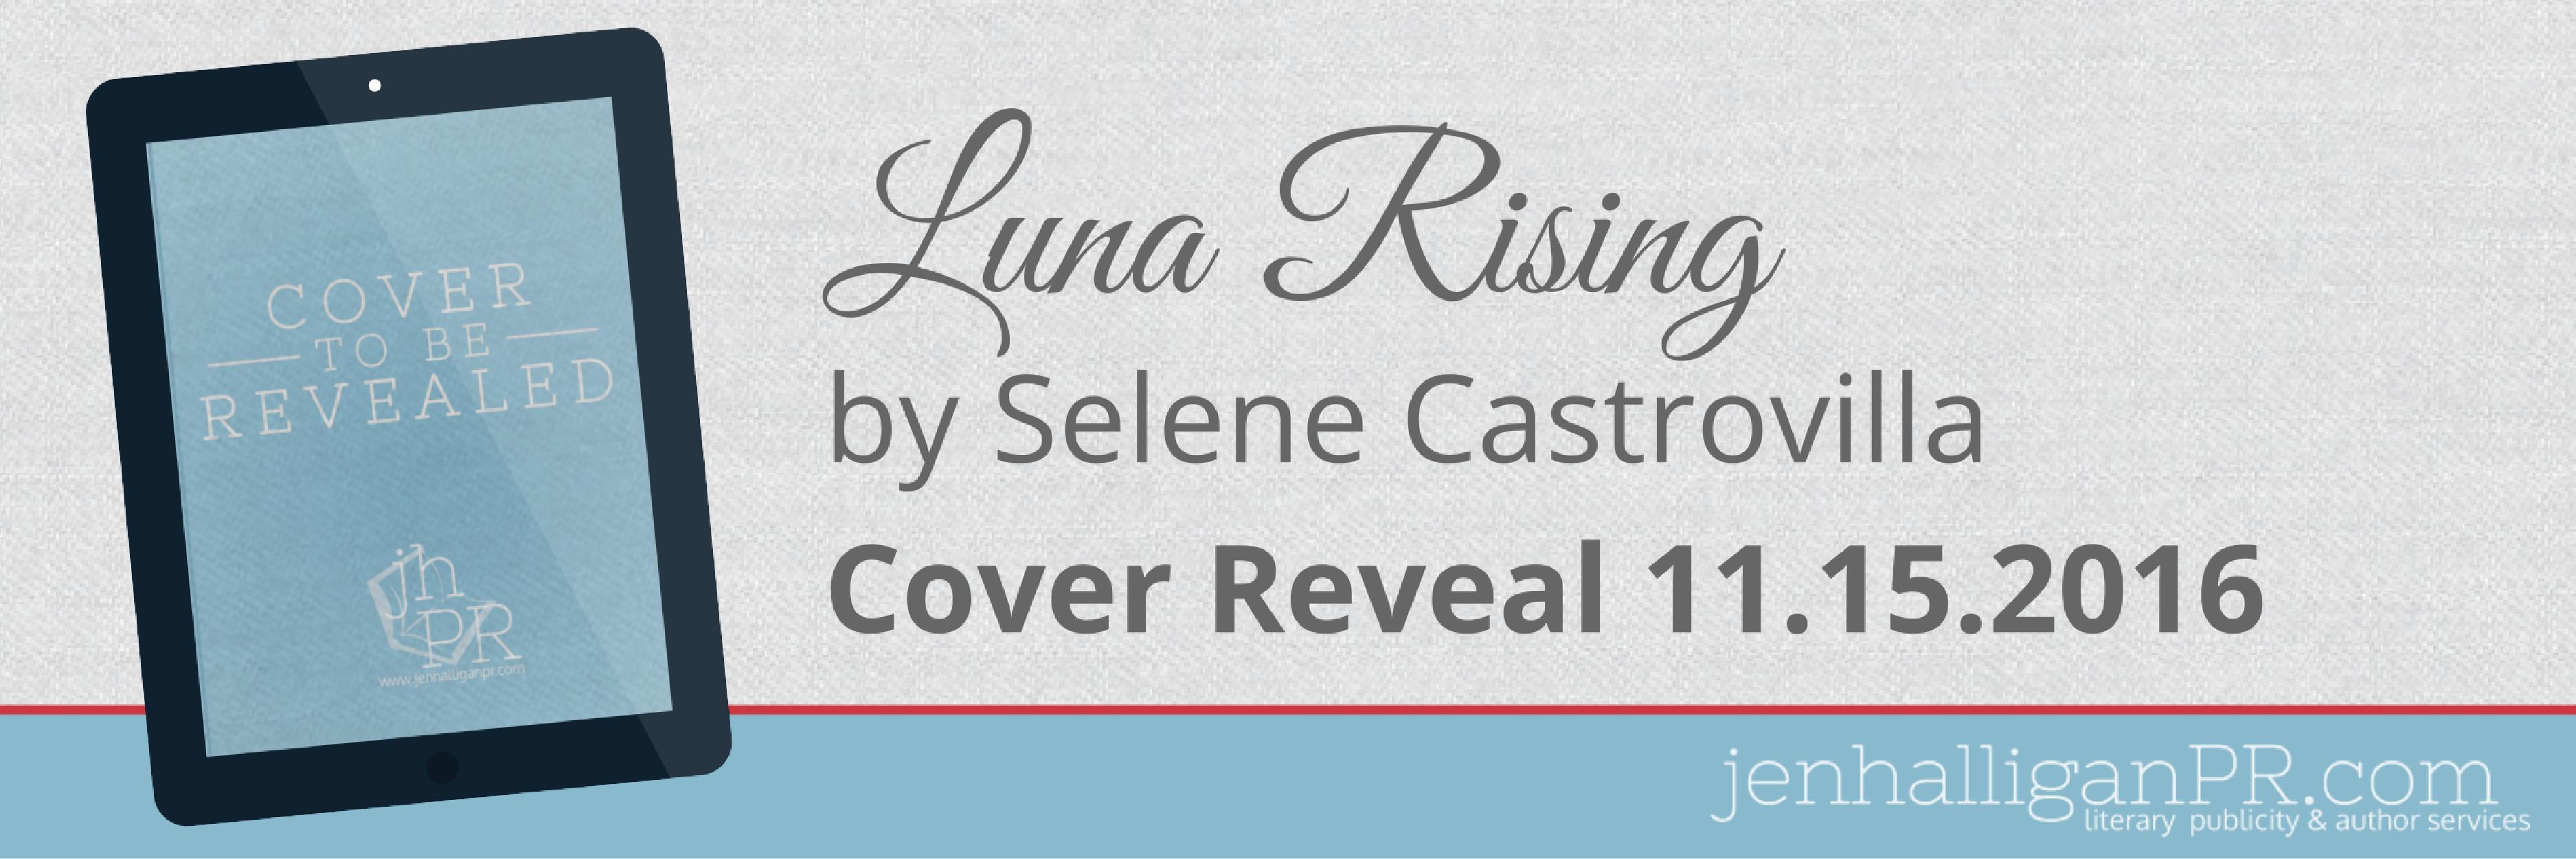 Luna Rising by Selene Castrovilla   JenHalliganPR.com